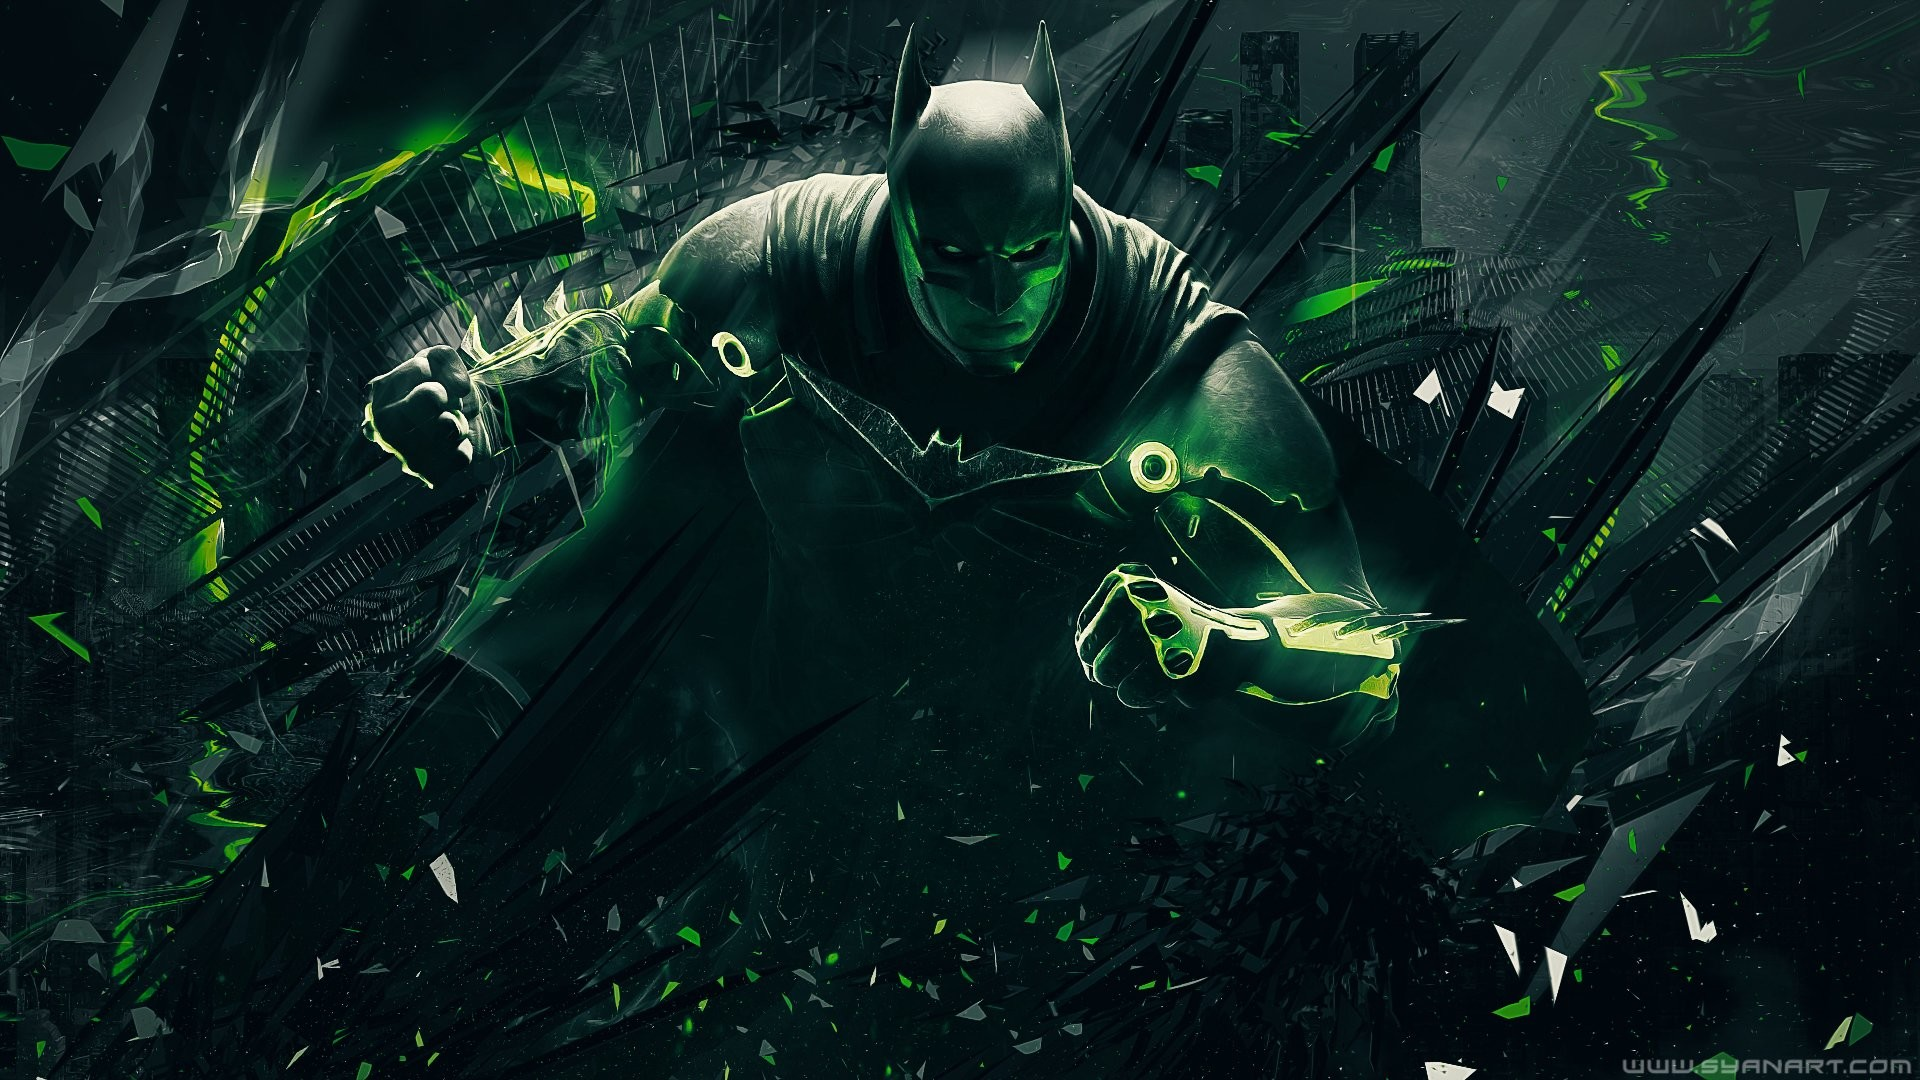 Video Game – Injustice 2 Batman Green Wallpaper